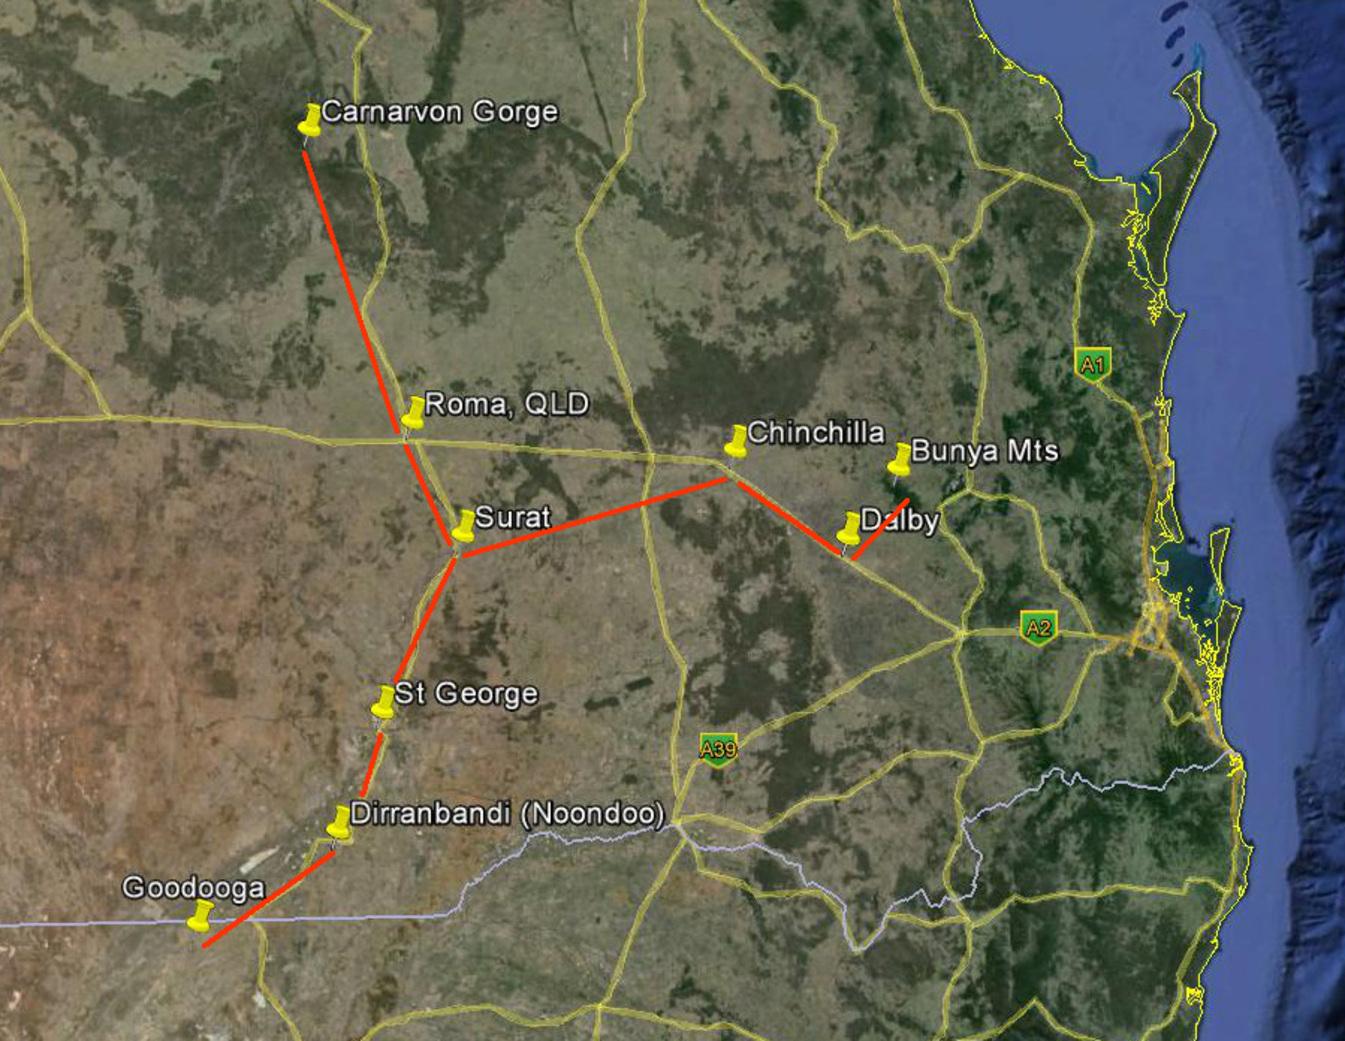 Carnarvon Gorge and Bunya Mts star maps overlaid on road map. - Image Credit: Google Earth